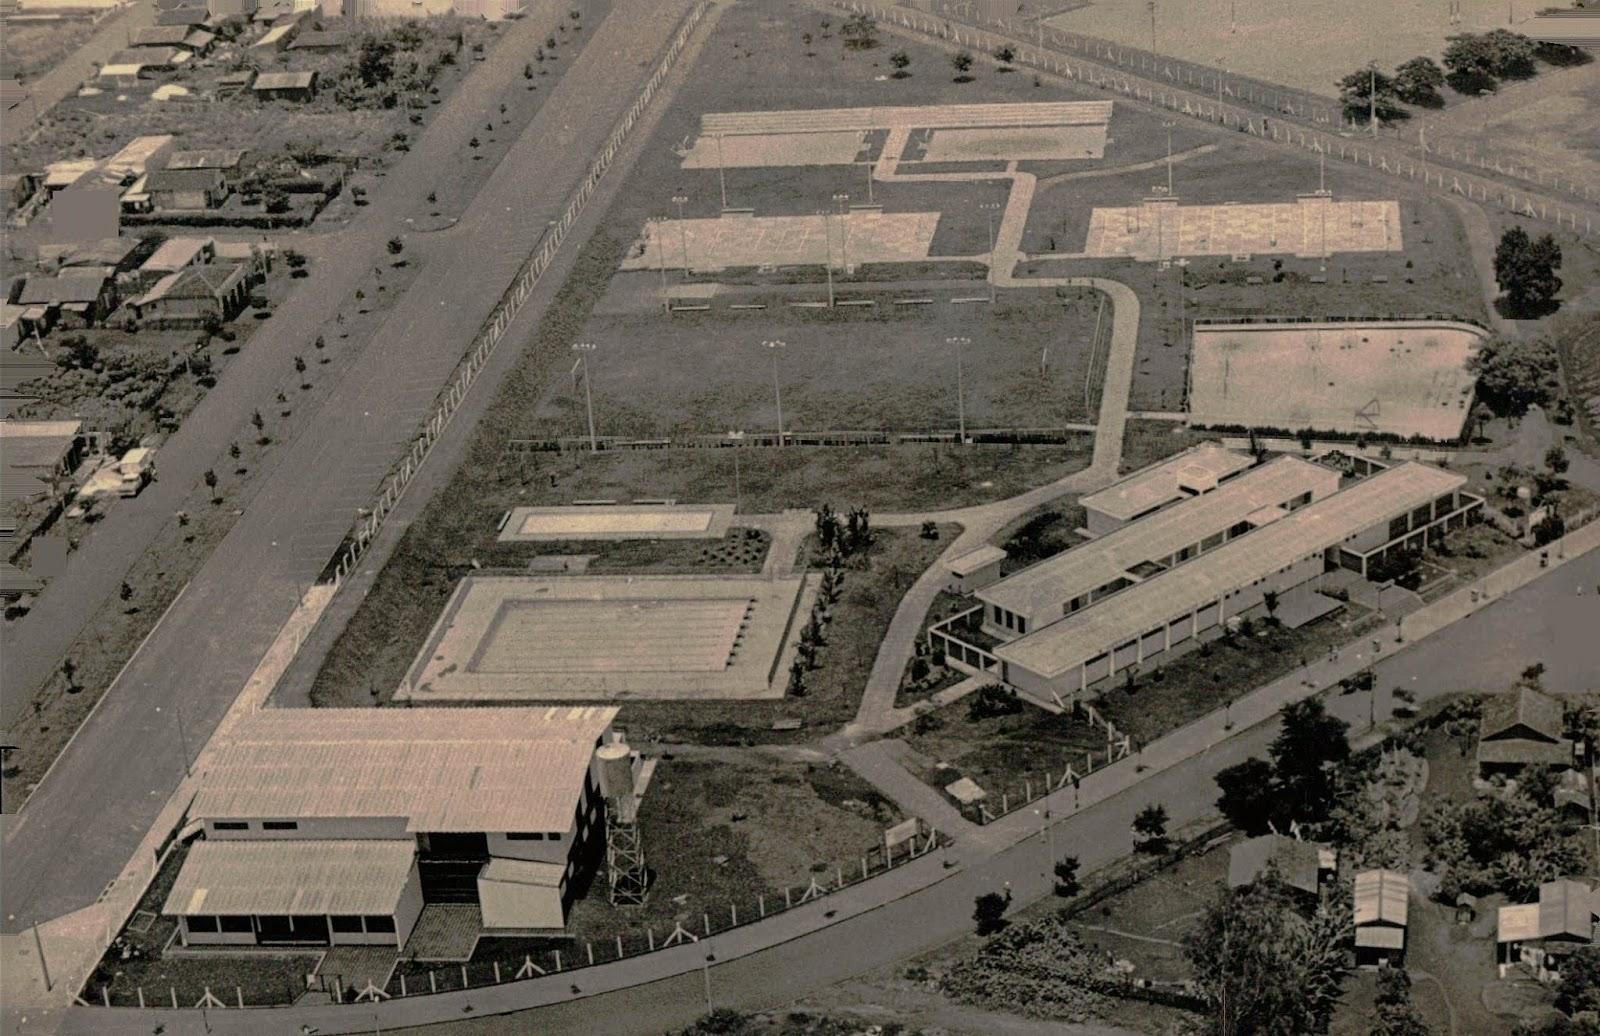 Centro Social Urbano - 1980